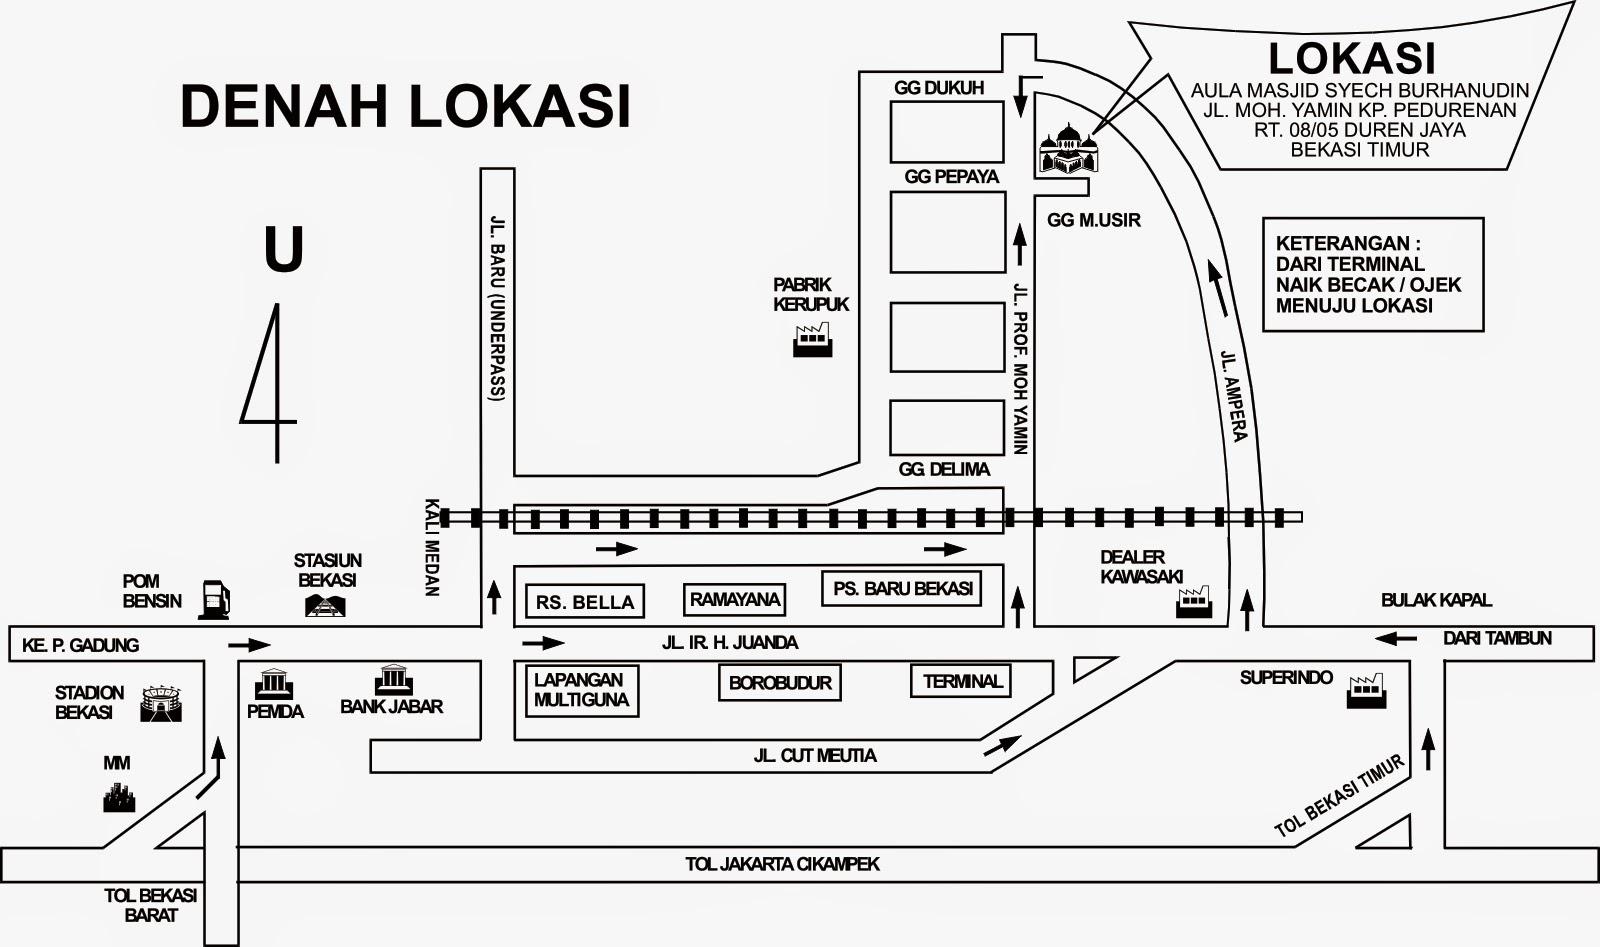 Denah Lokasi Butik Normaboutique Taufik Afdal Email